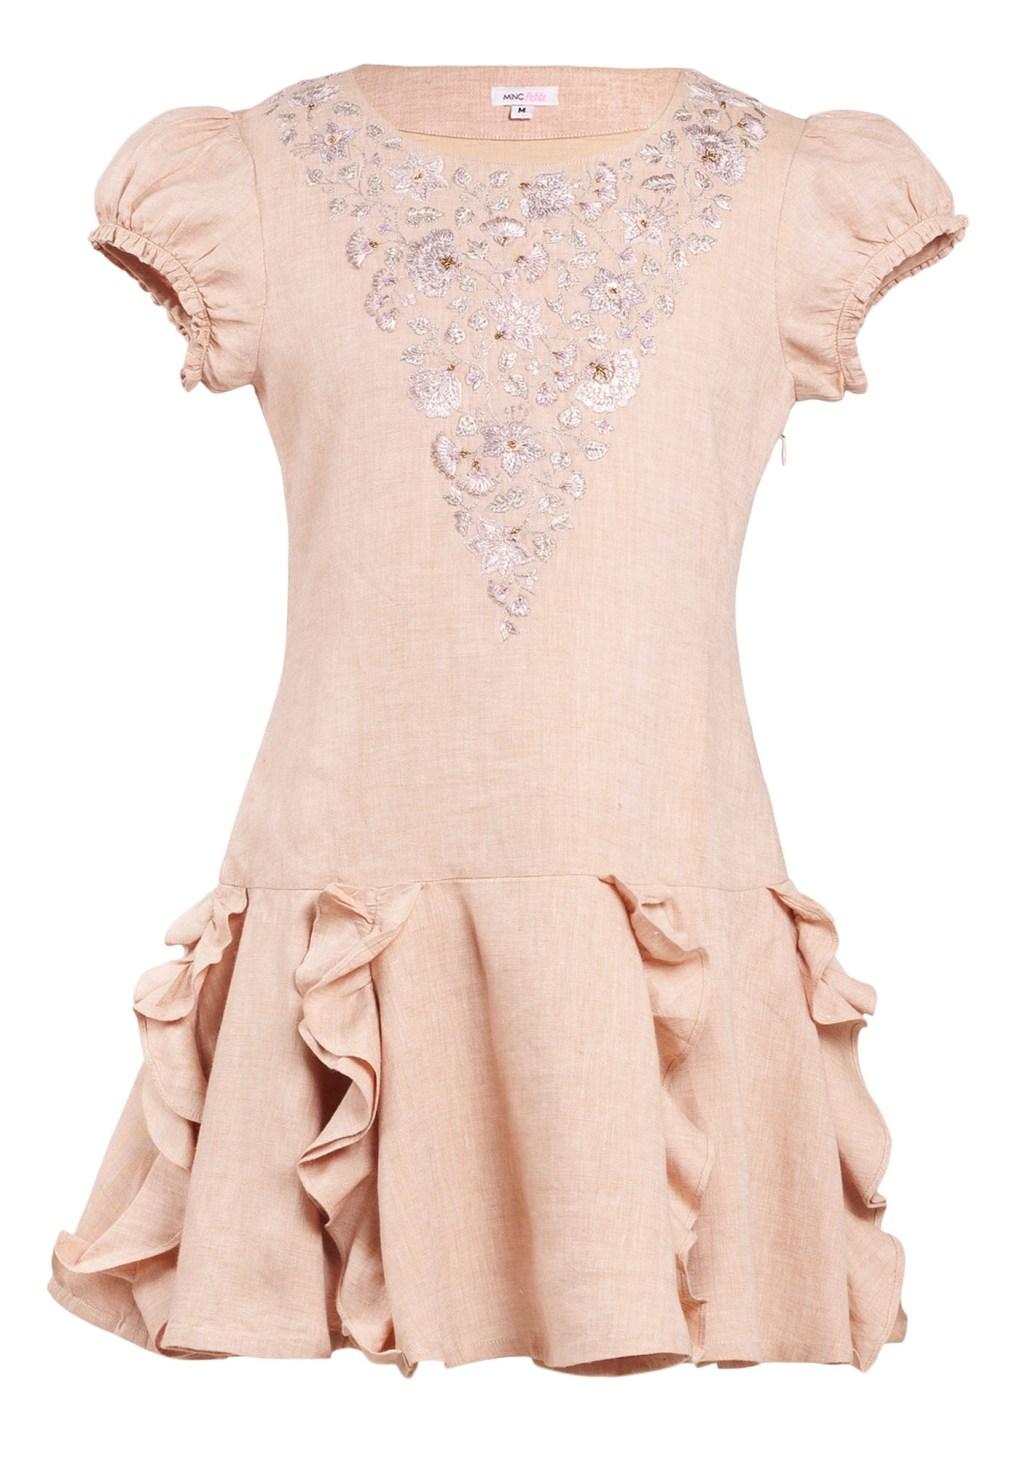 MINC Petite Preppy Girls Embroidered Dress in Dune Beige Linen